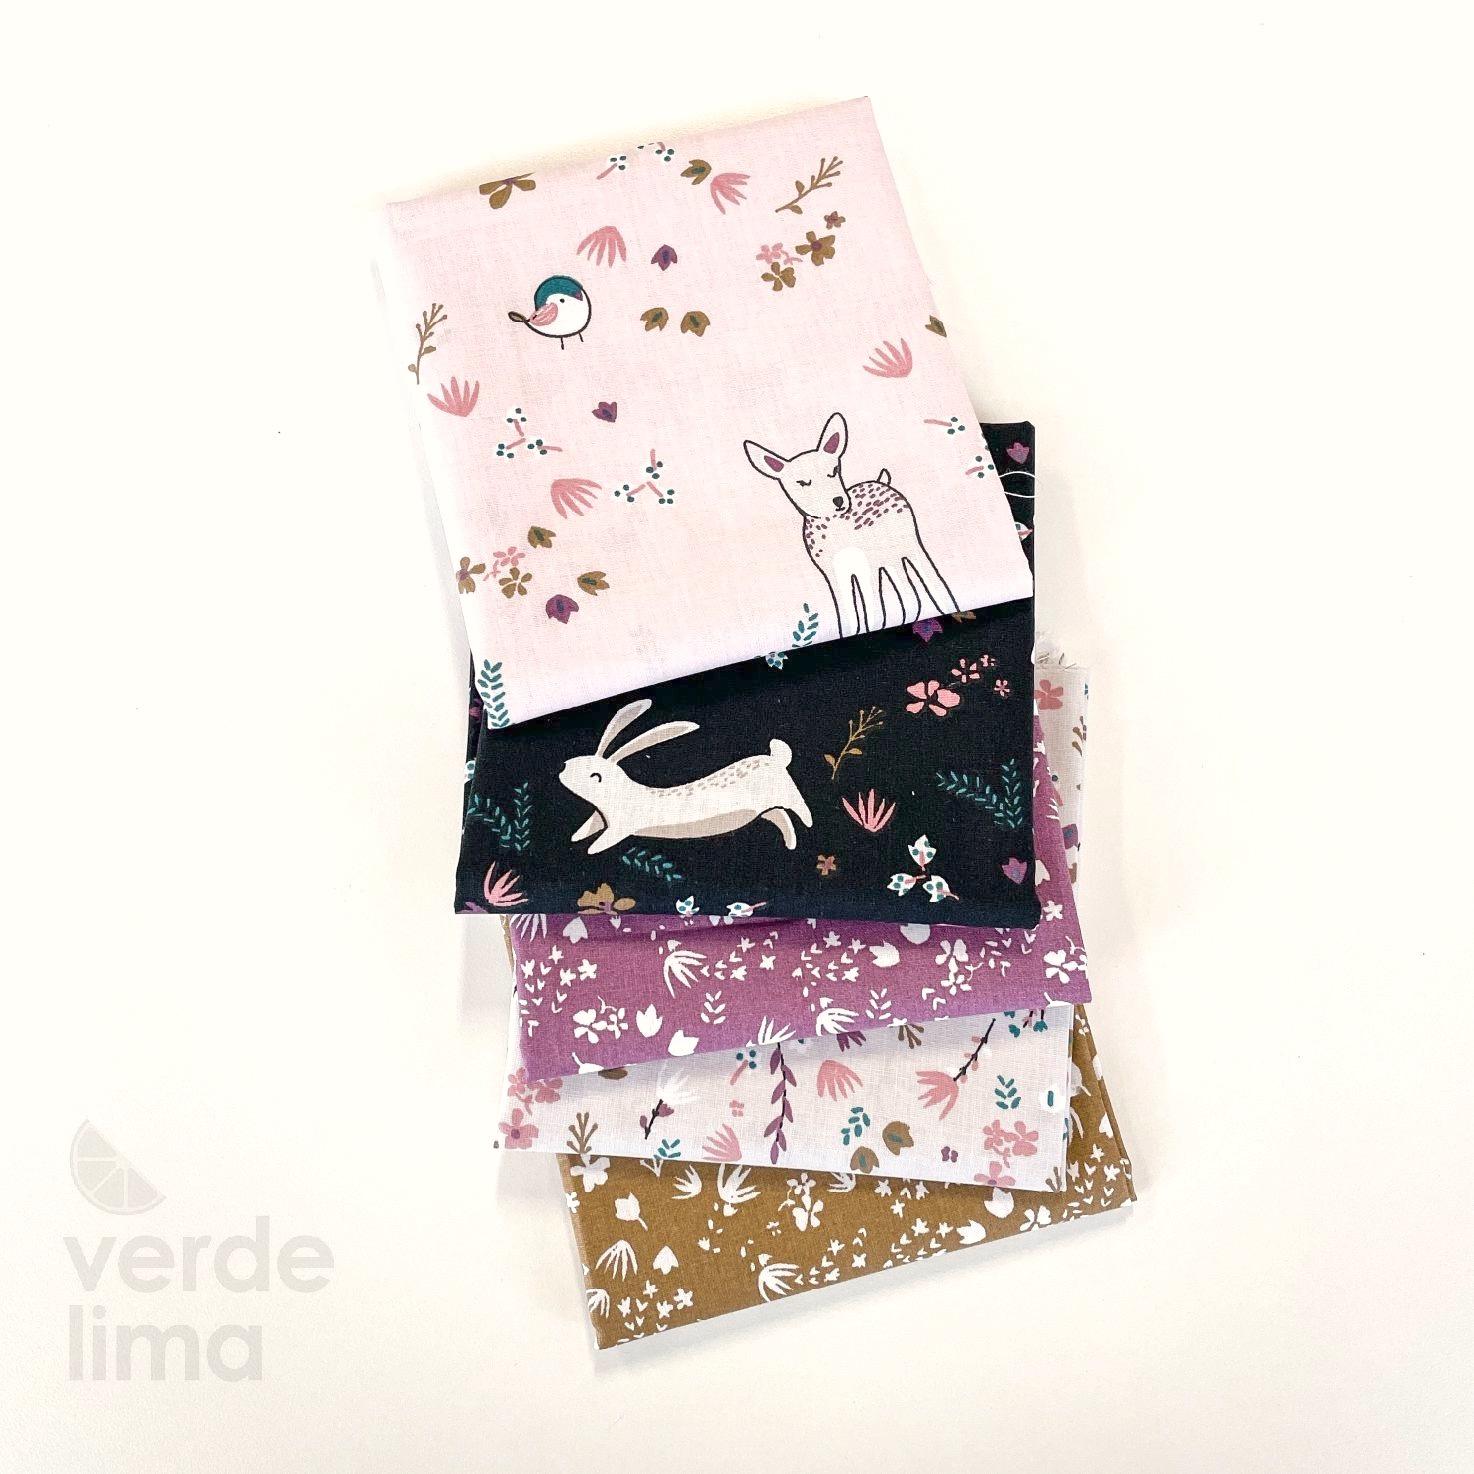 Pack de tecidos - Bosque Encantado